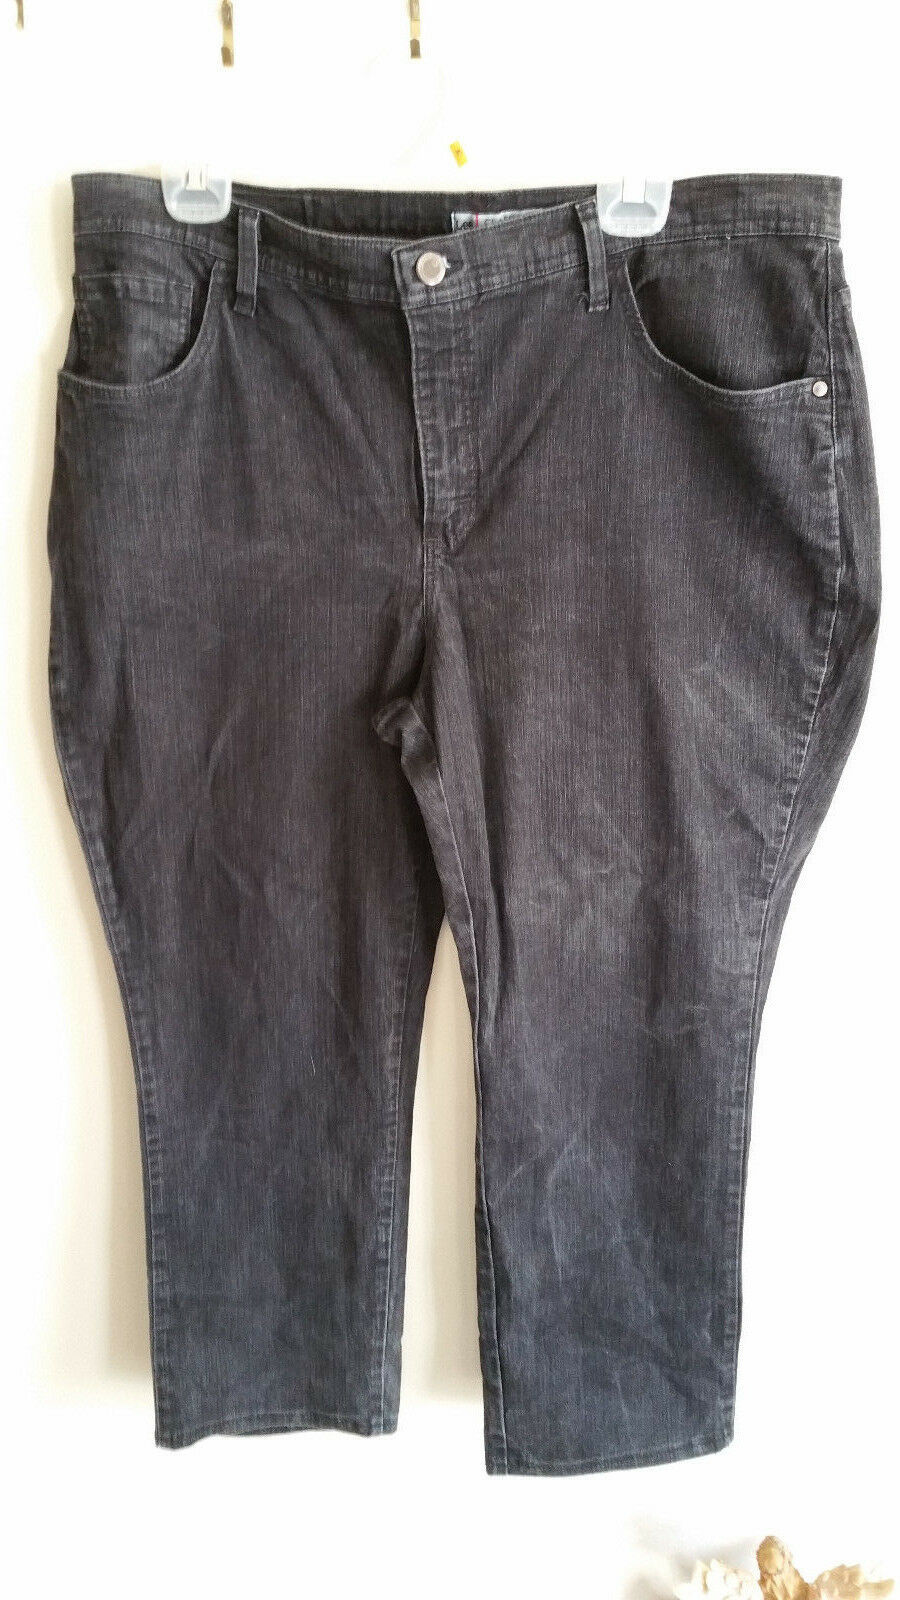 Plus size Petite 18W  Lee Jeans Classic Fit Dark Wash Stright Leg